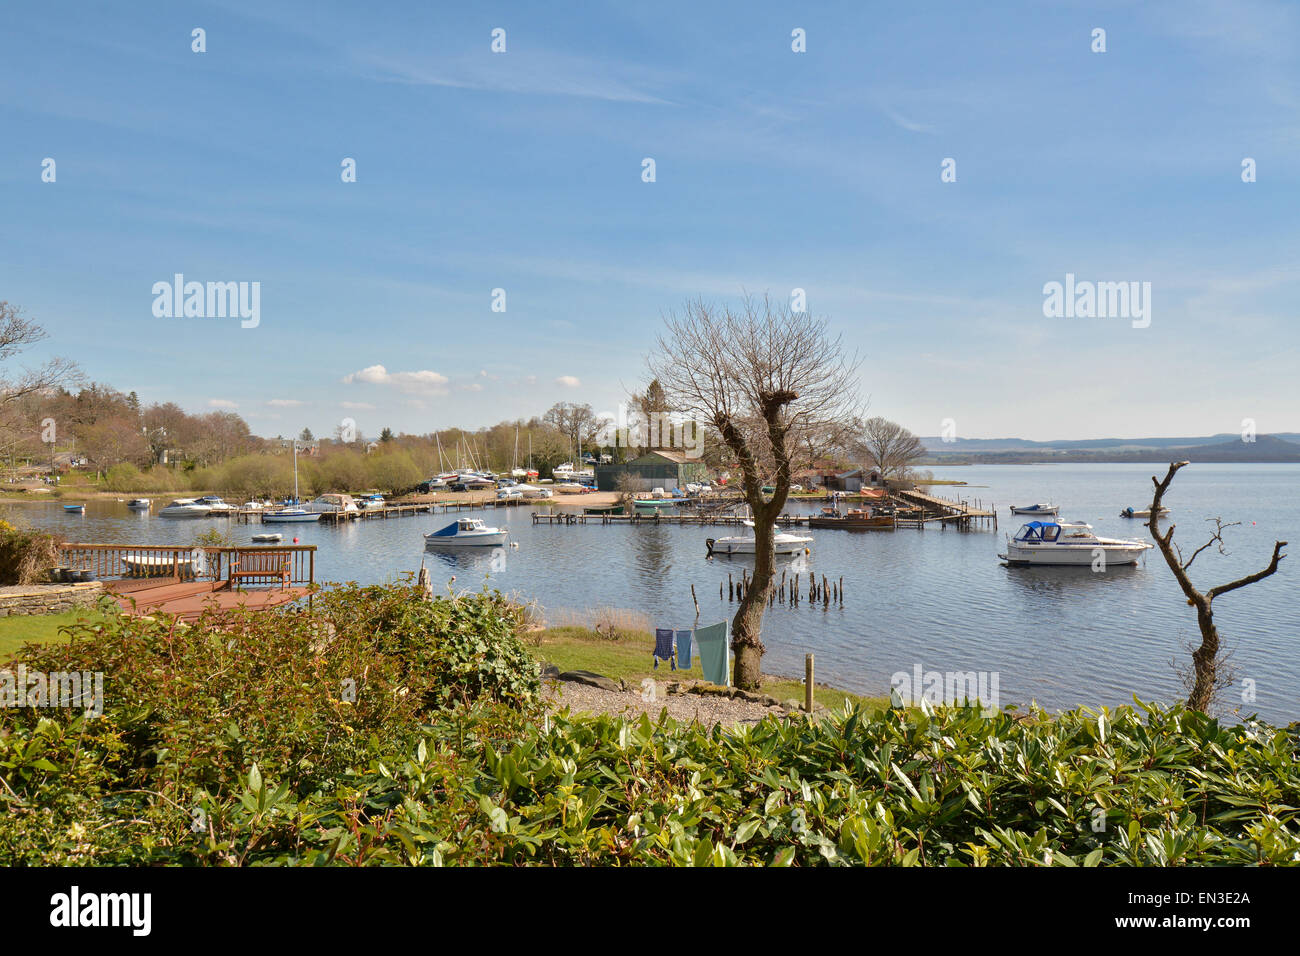 BALMAHA, LOCH LOMOND, SCOTLAND, UK - 22 APRIL 2015: Balmaha boatyard and marina on still, warm spring day - Stock Image